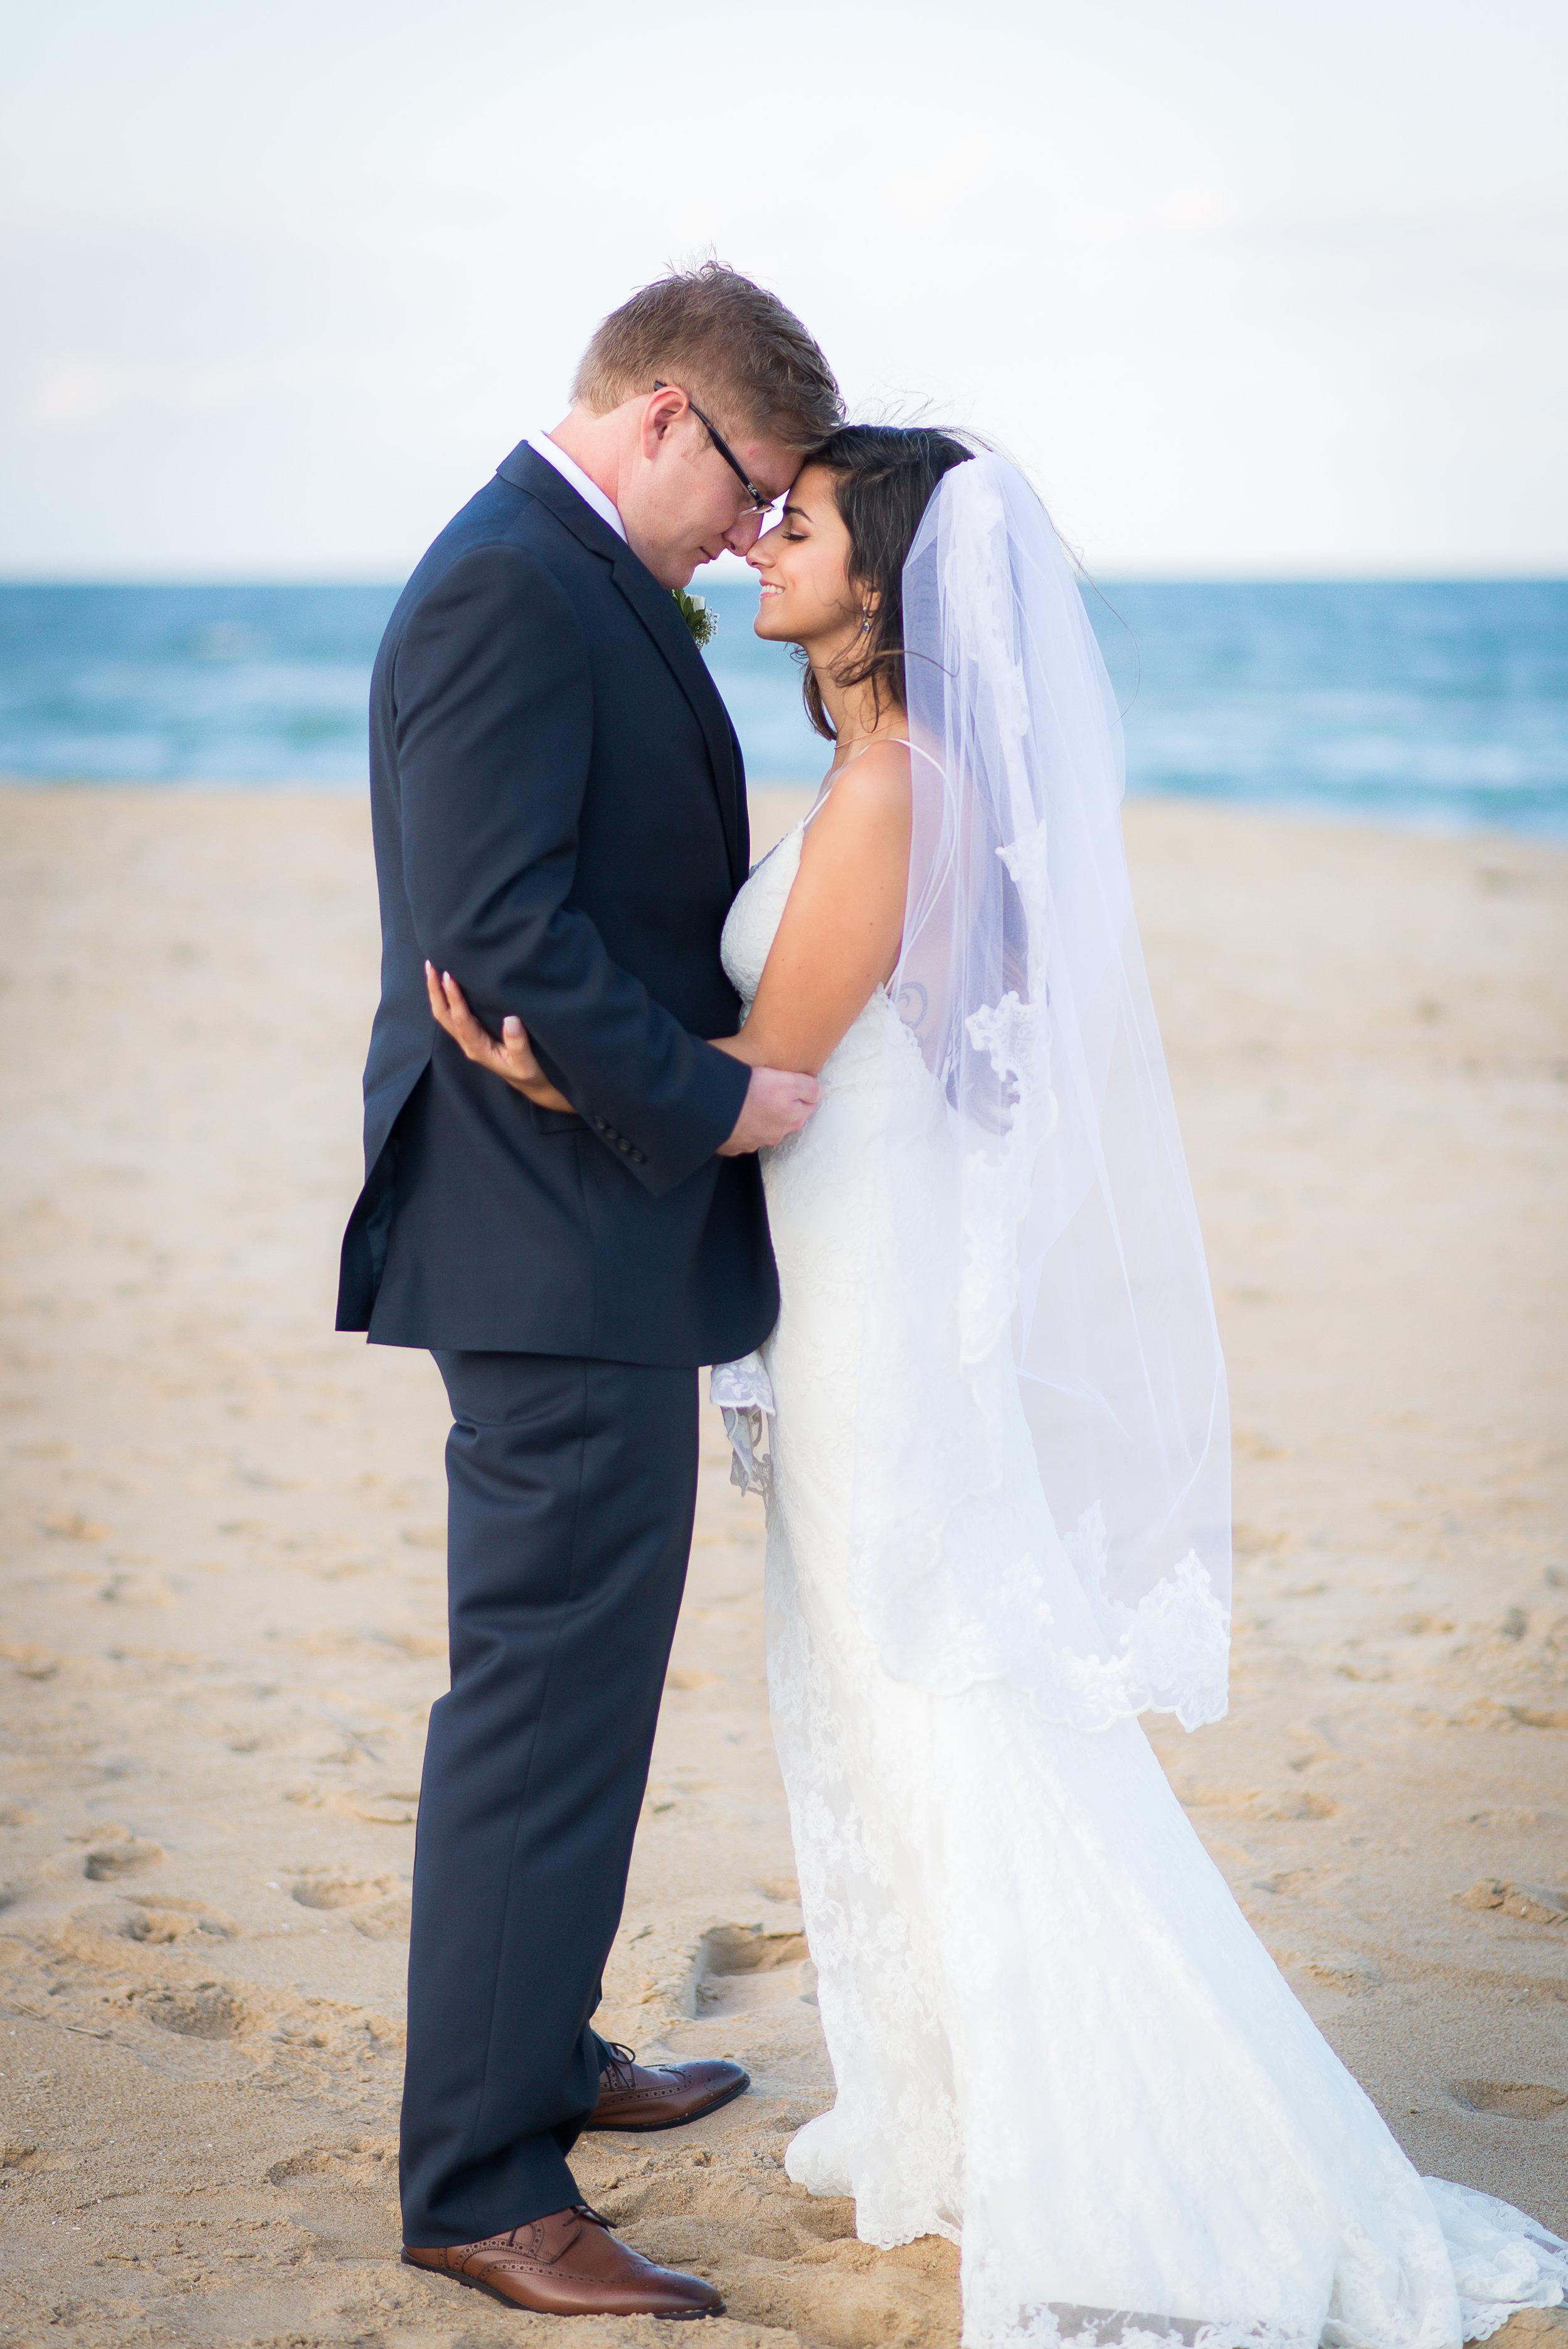 Erica + Robert Married498 copy.jpg